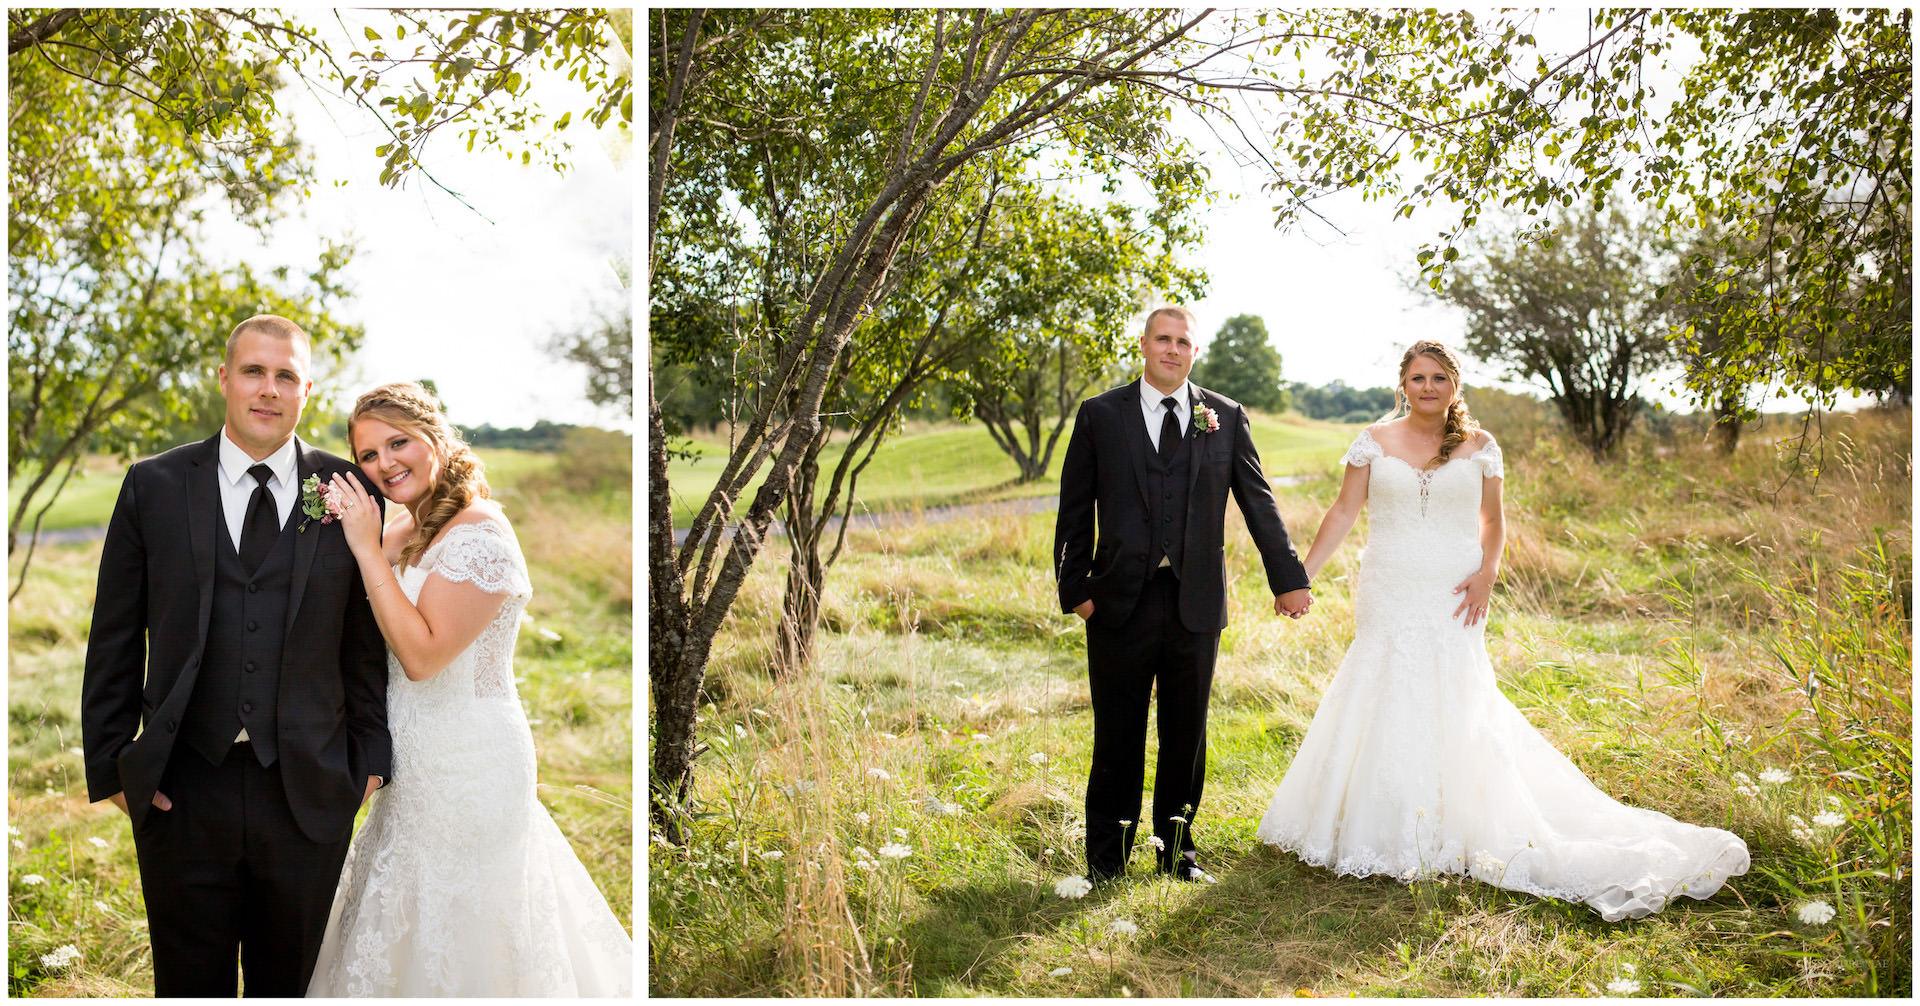 Cassondre Mae Photography Hudson Valley Wedding Photographer 7.jpg